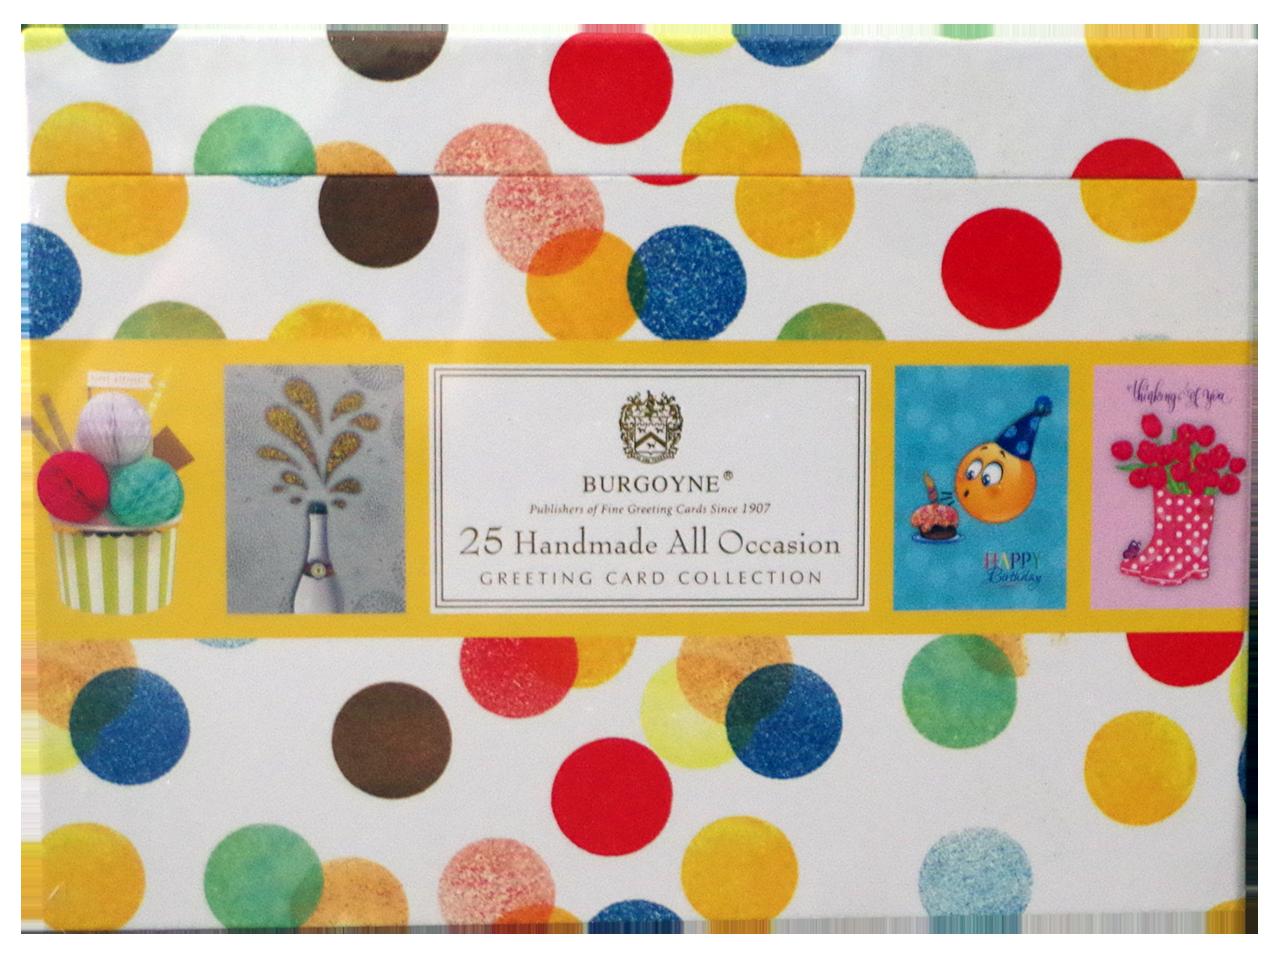 Burgoyne 25 handmade all occasion cards